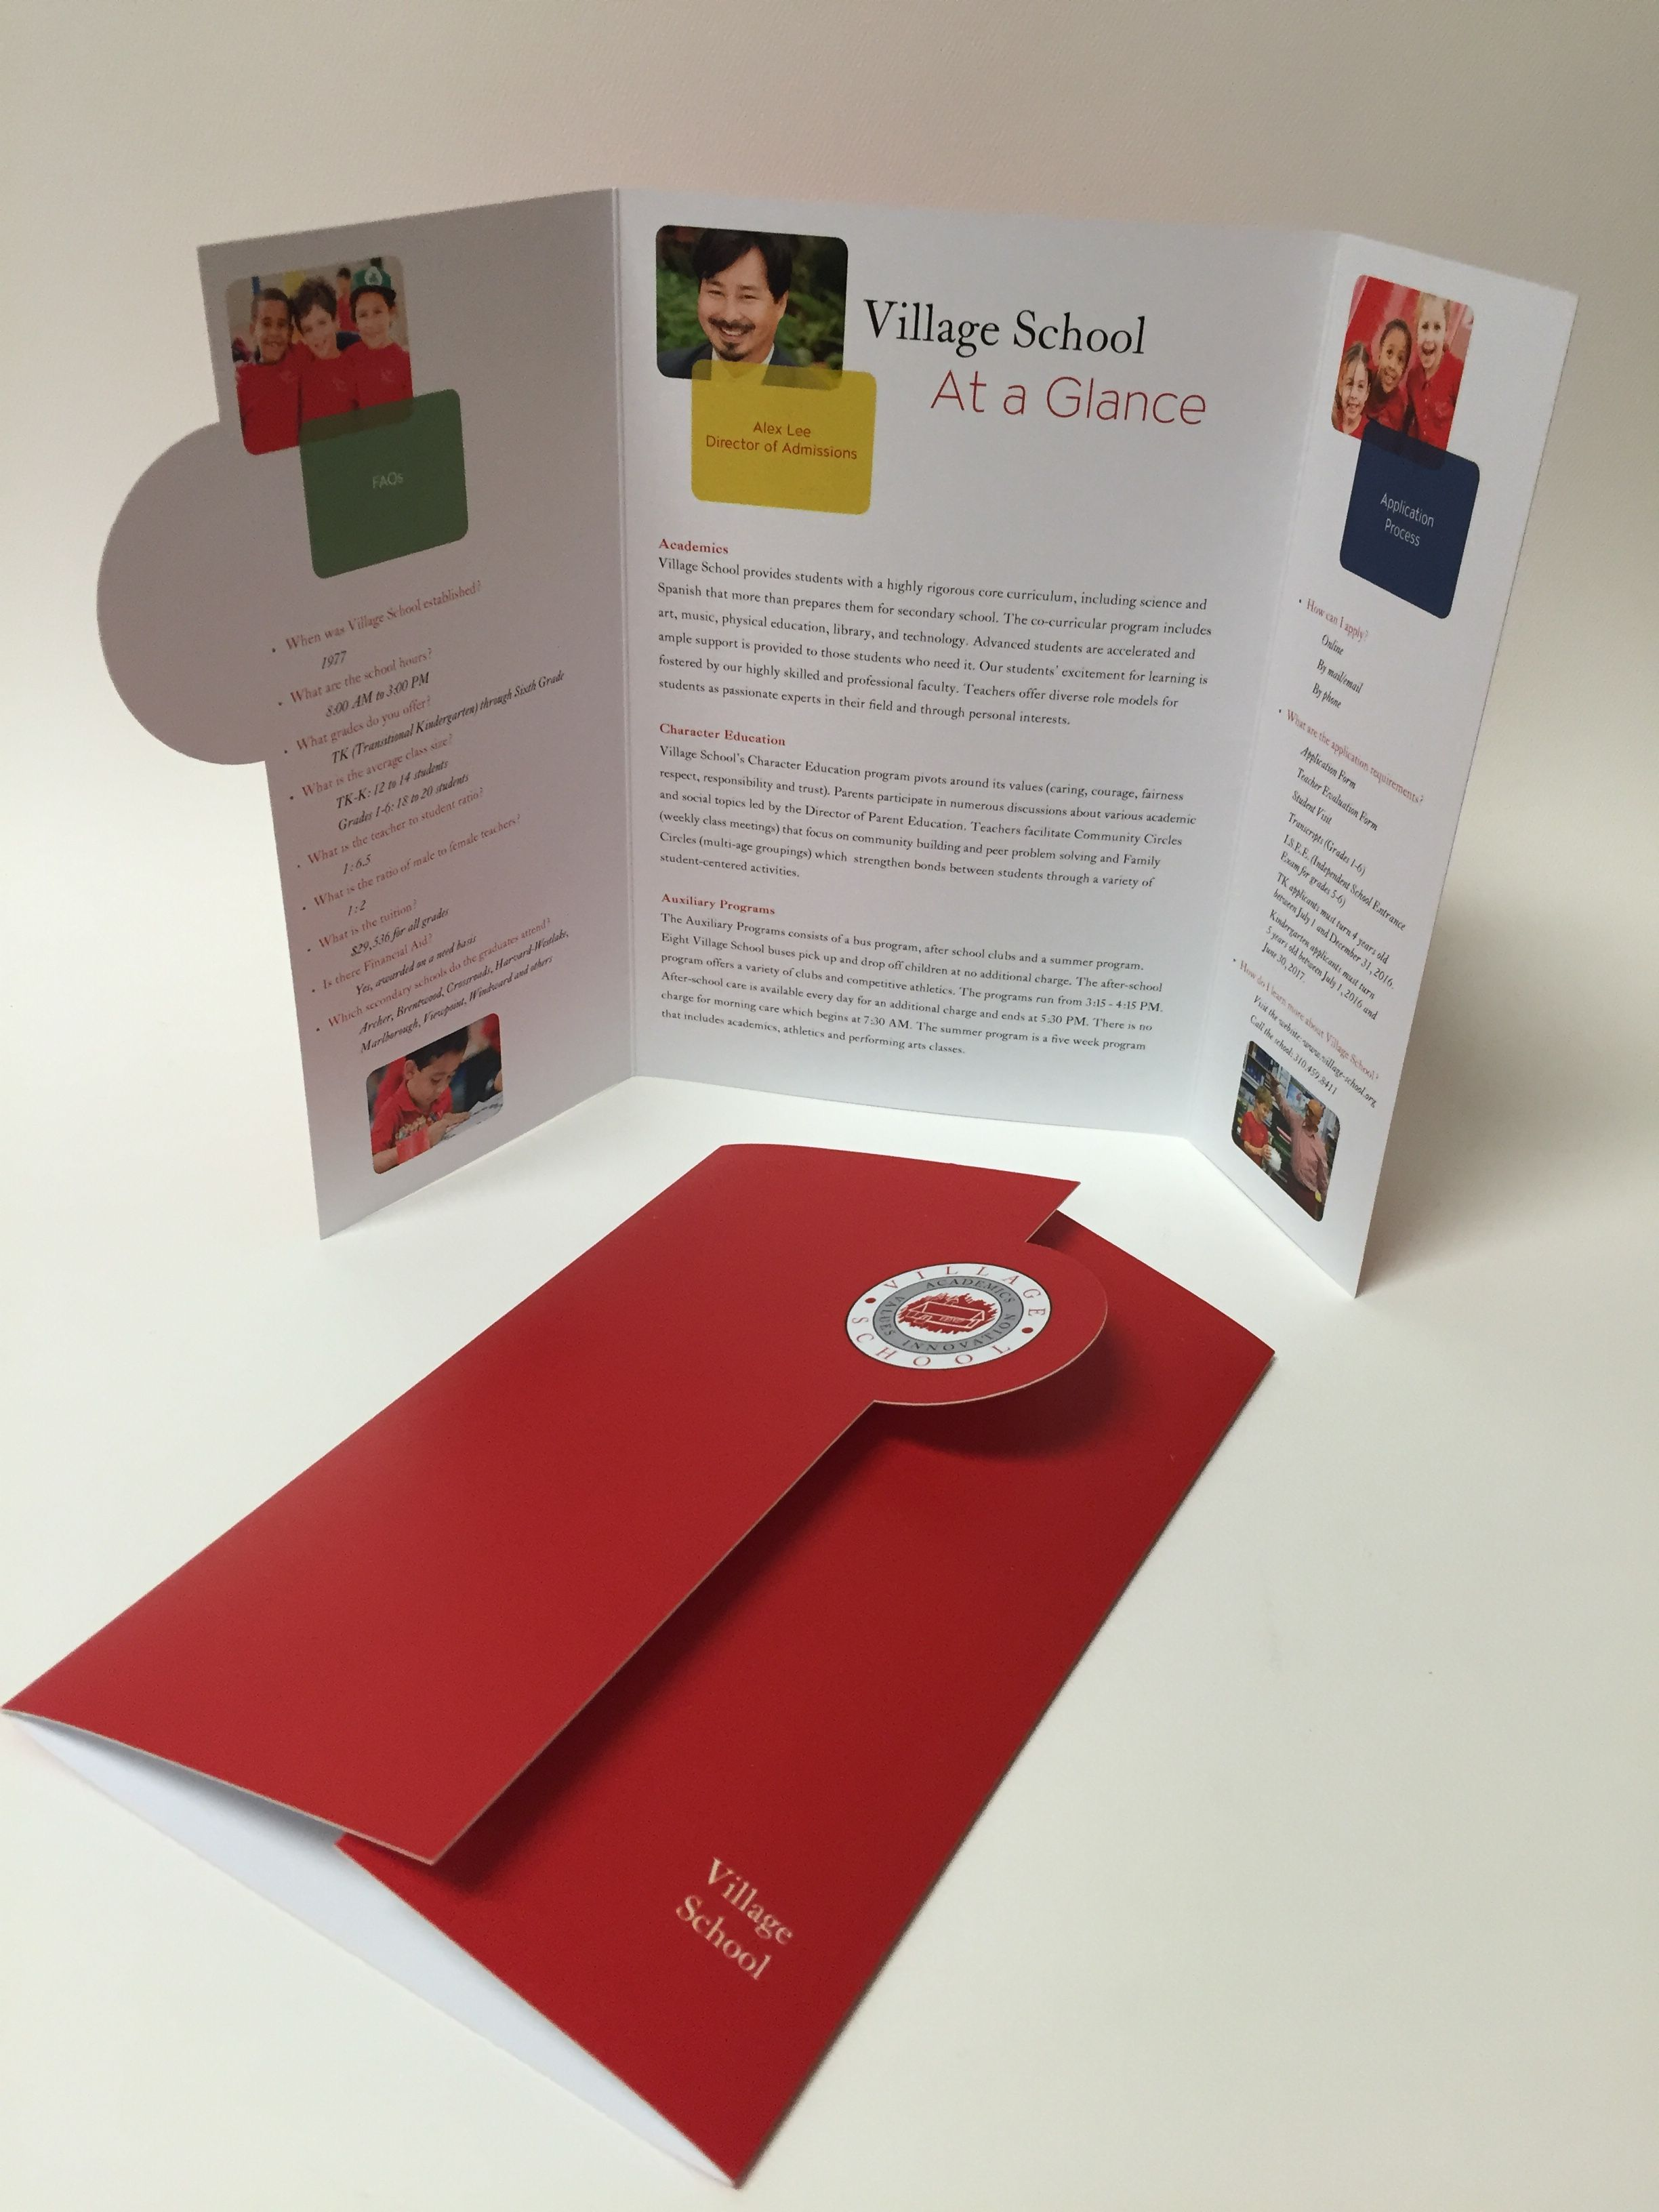 village school faq brochure zorn design studio carol zorn